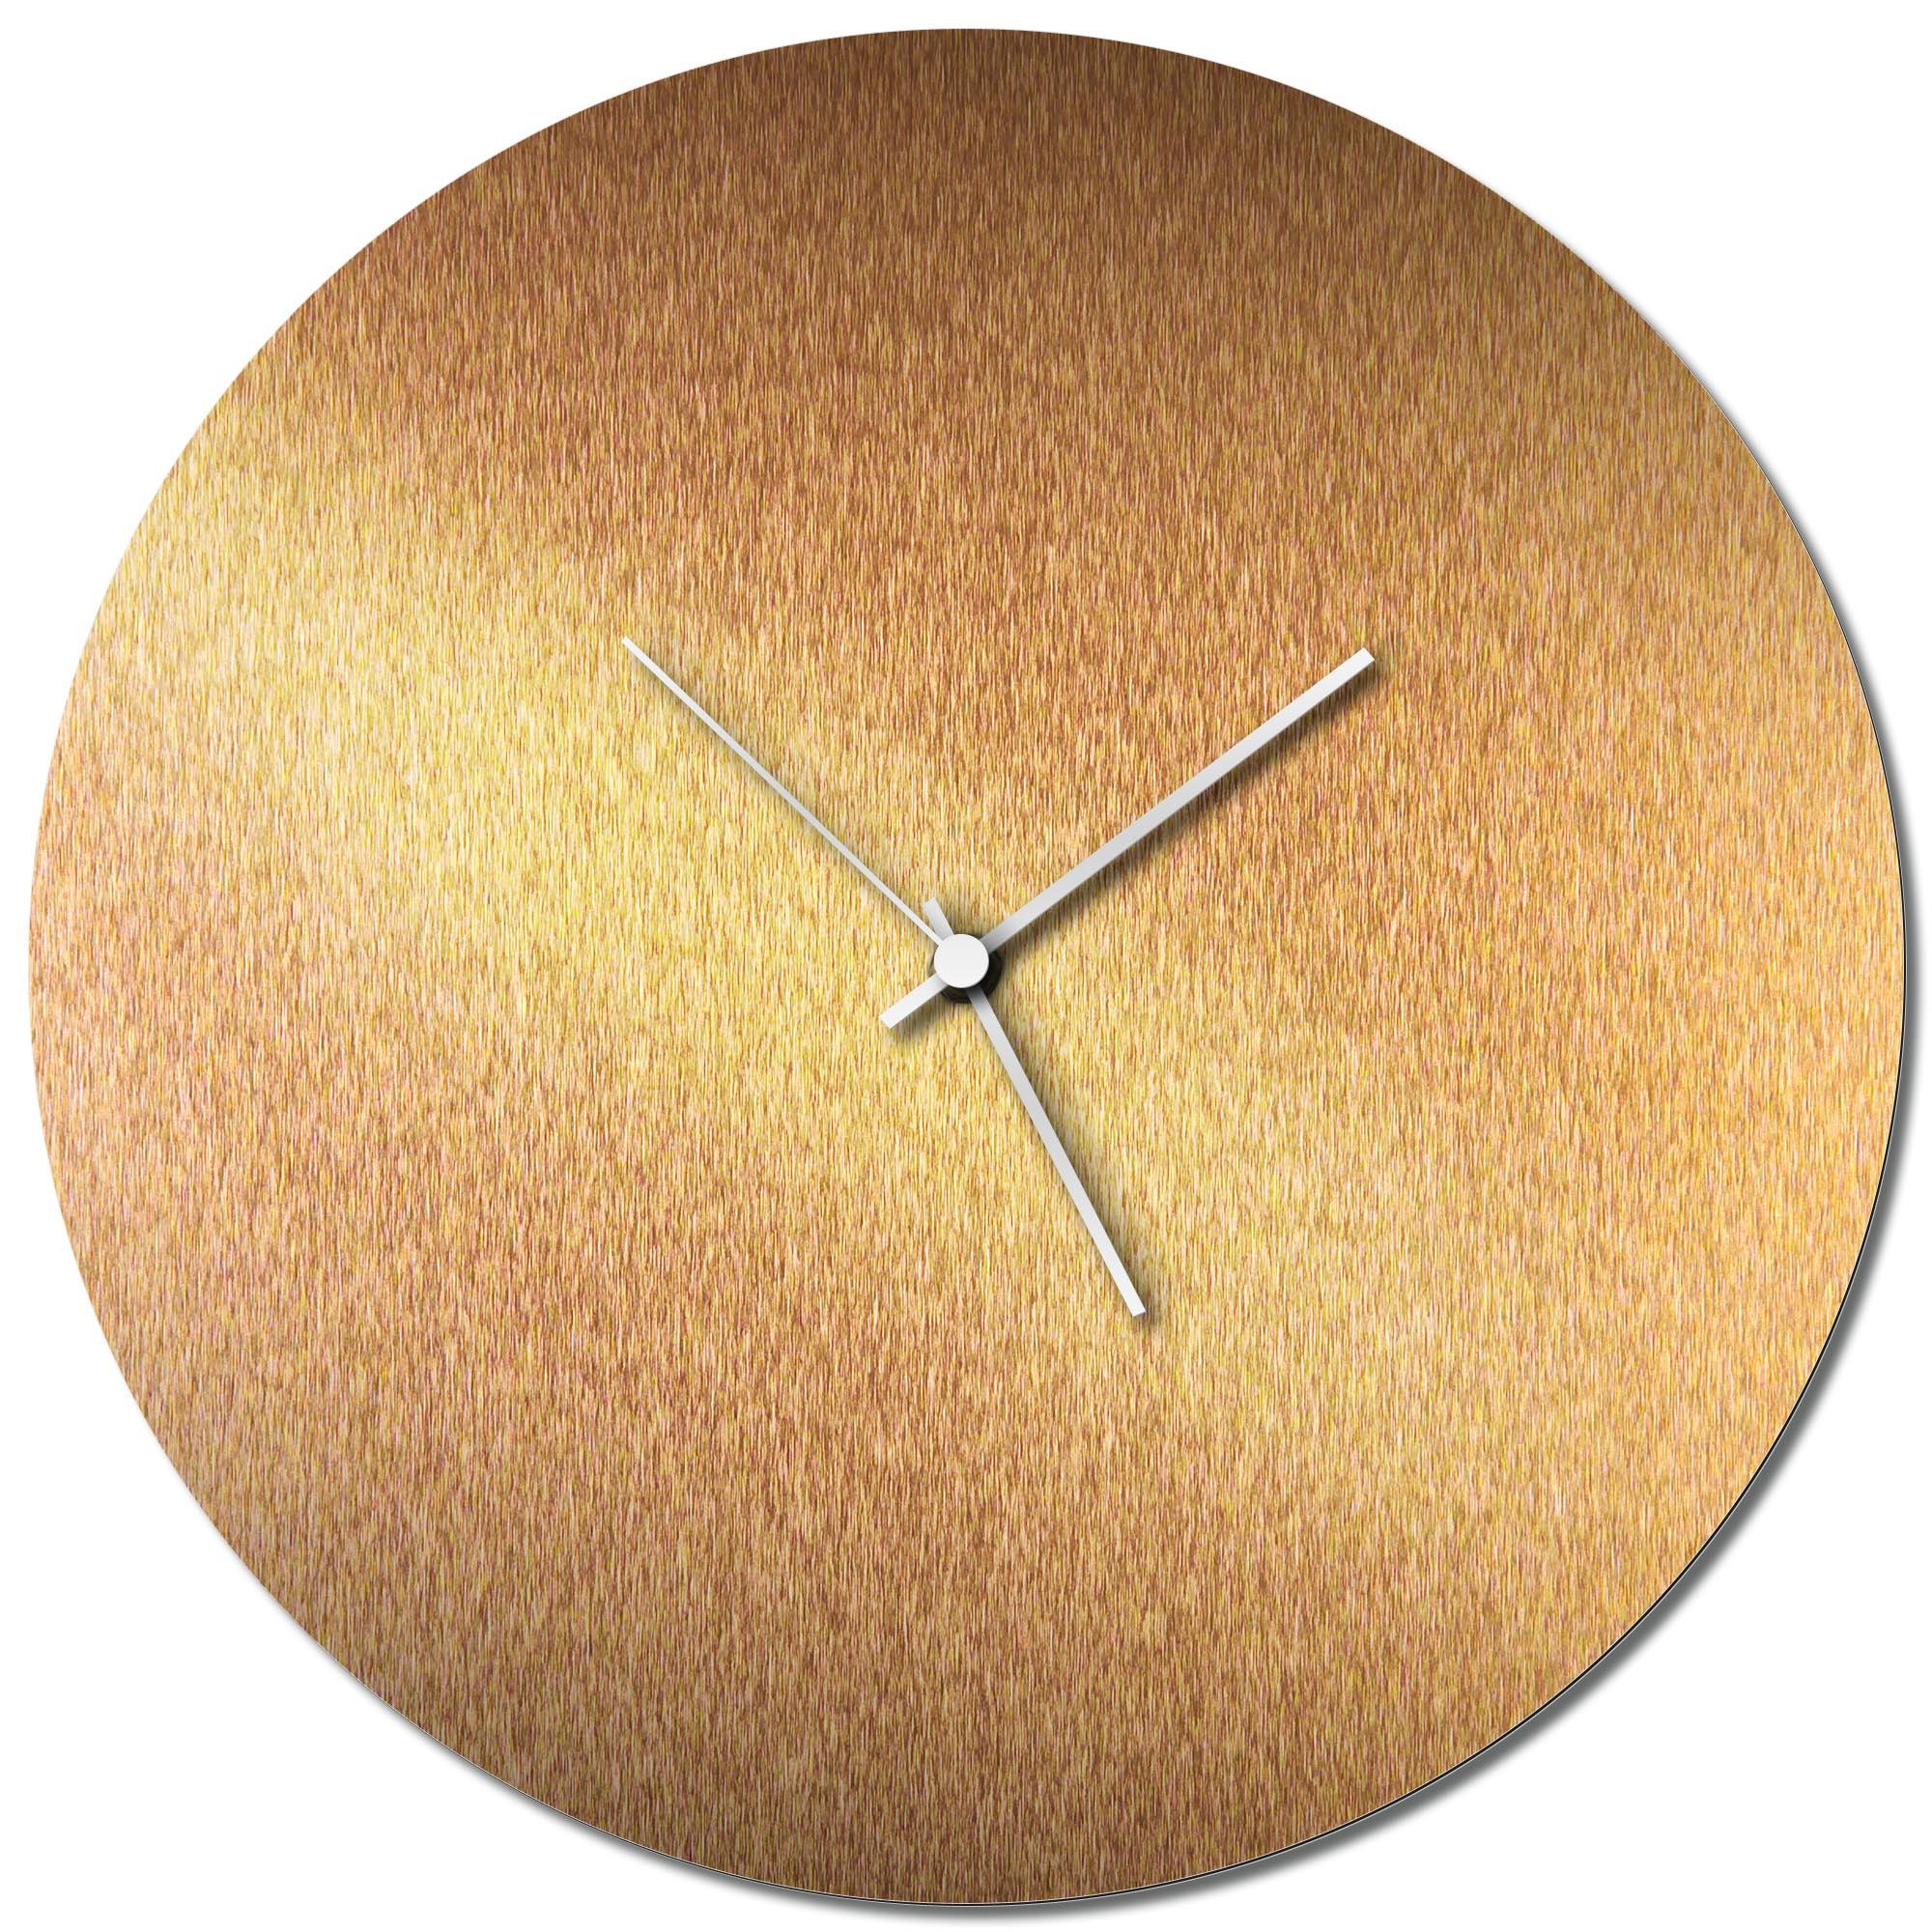 Adam Schwoeppe 'Bronzesmith Circle Clock Large White' Midcentury Modern Style Wall Clock